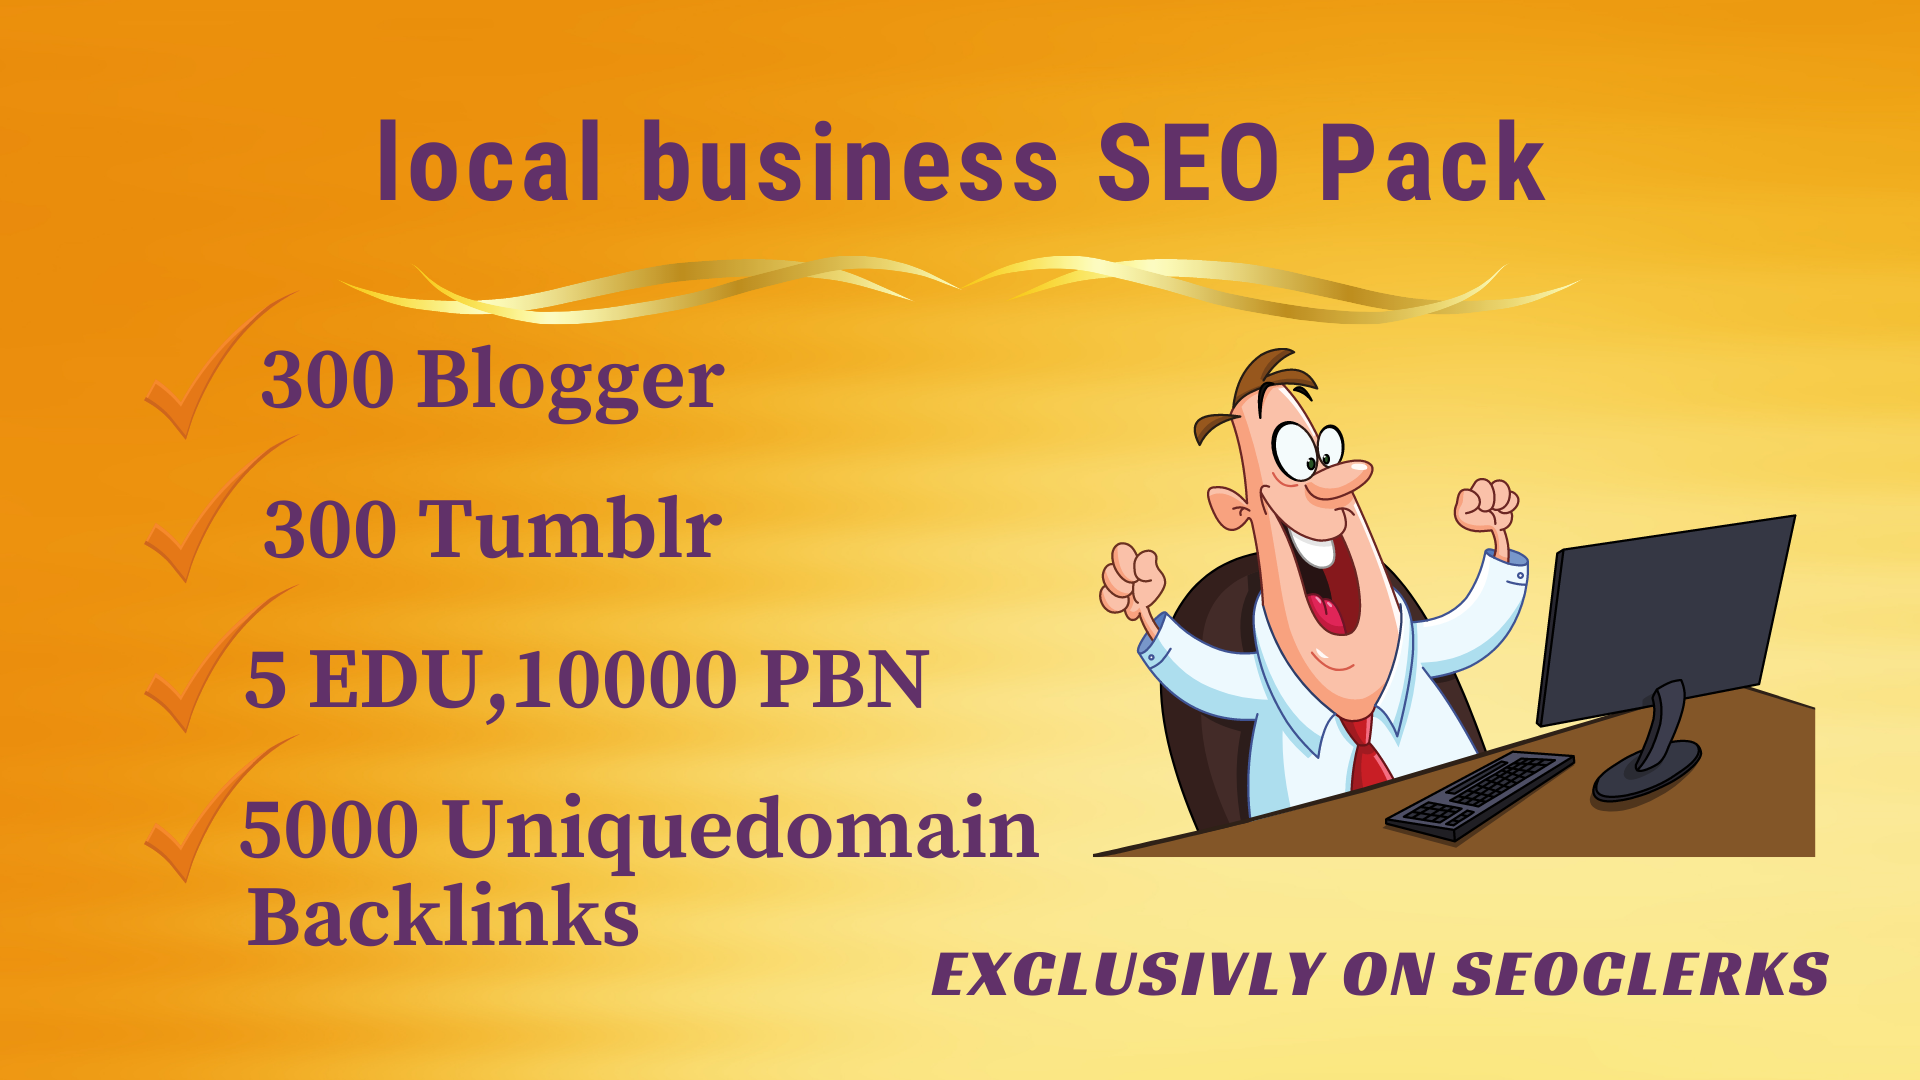 local business SEO Pack - Get 5 EDU,  300 blogger,  tumblr,  10000 PBN,  5000 uniquedomain backlinks